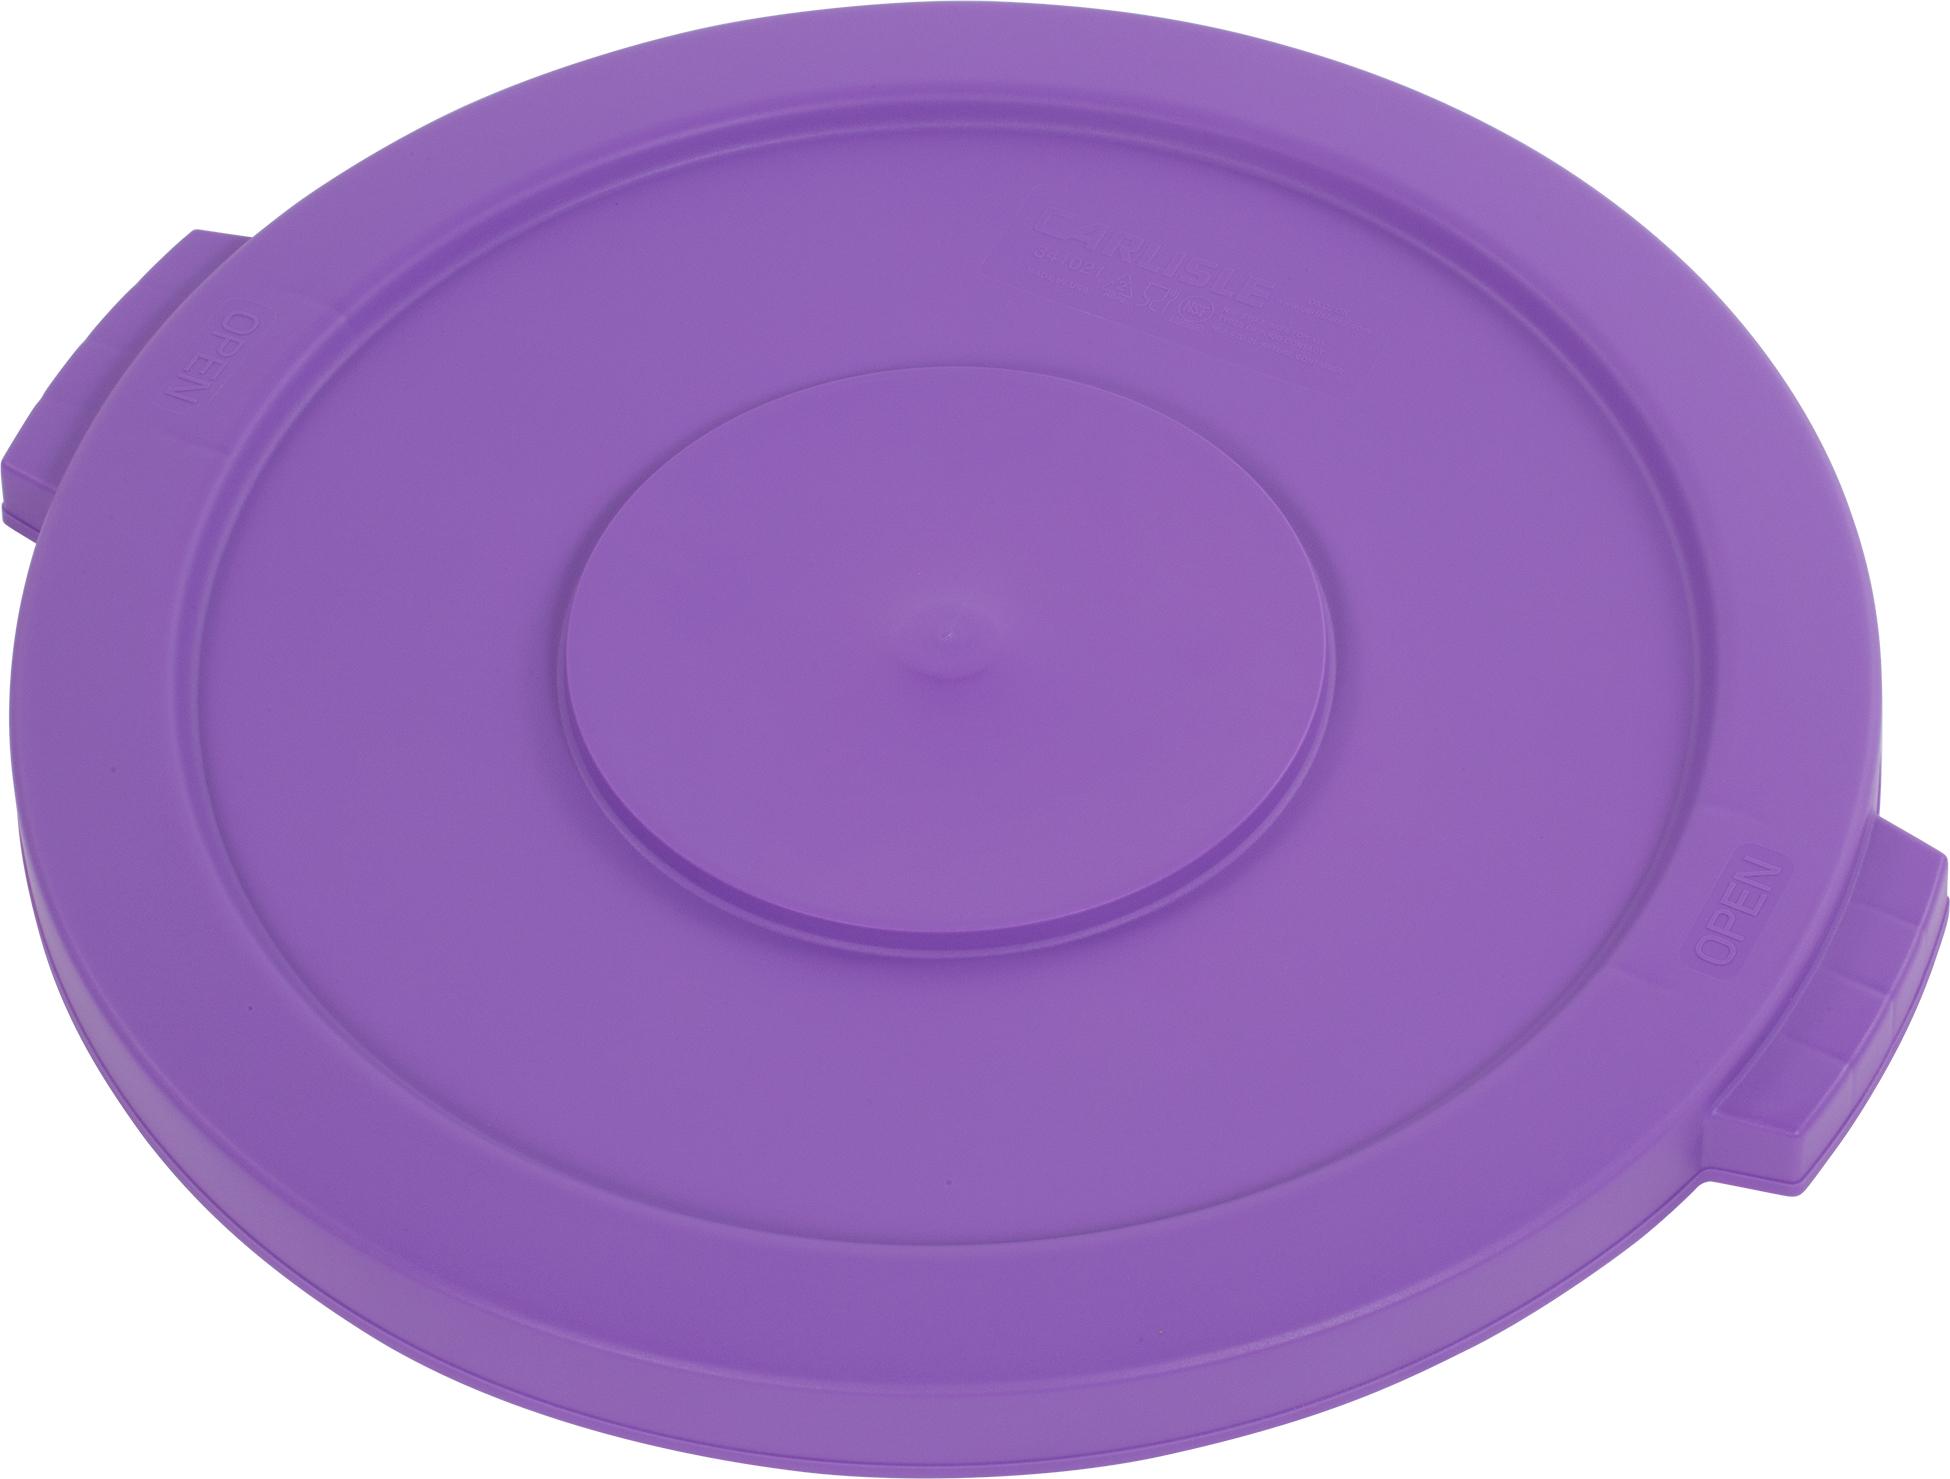 Bronco Round Waste Bin Food Container Lid 20 Gallon - Purple